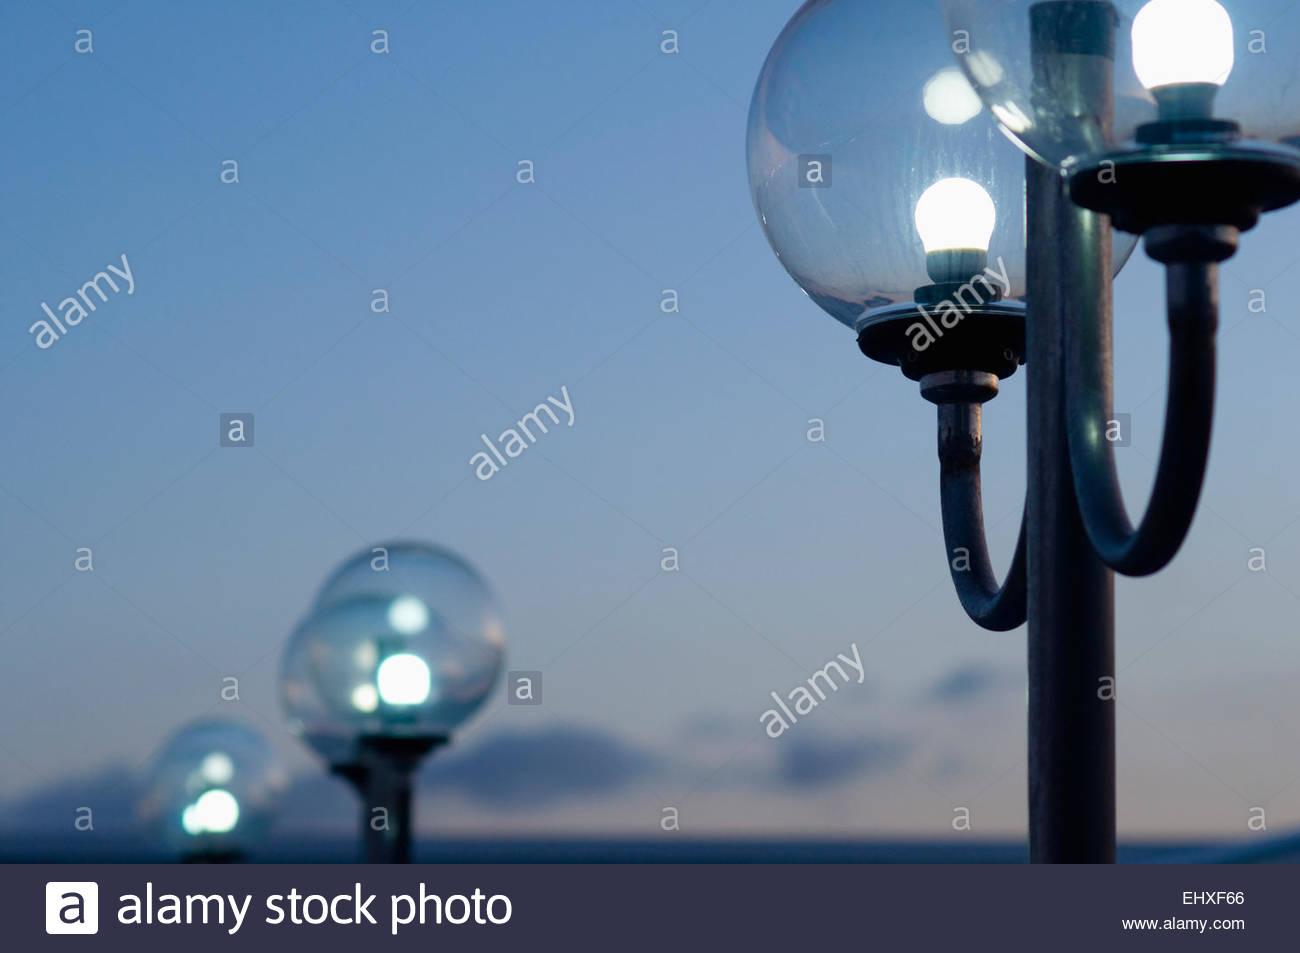 Lampen En Licht : Lampen licht sonnenaufgang globus glas zeile beleuchtet stockfoto